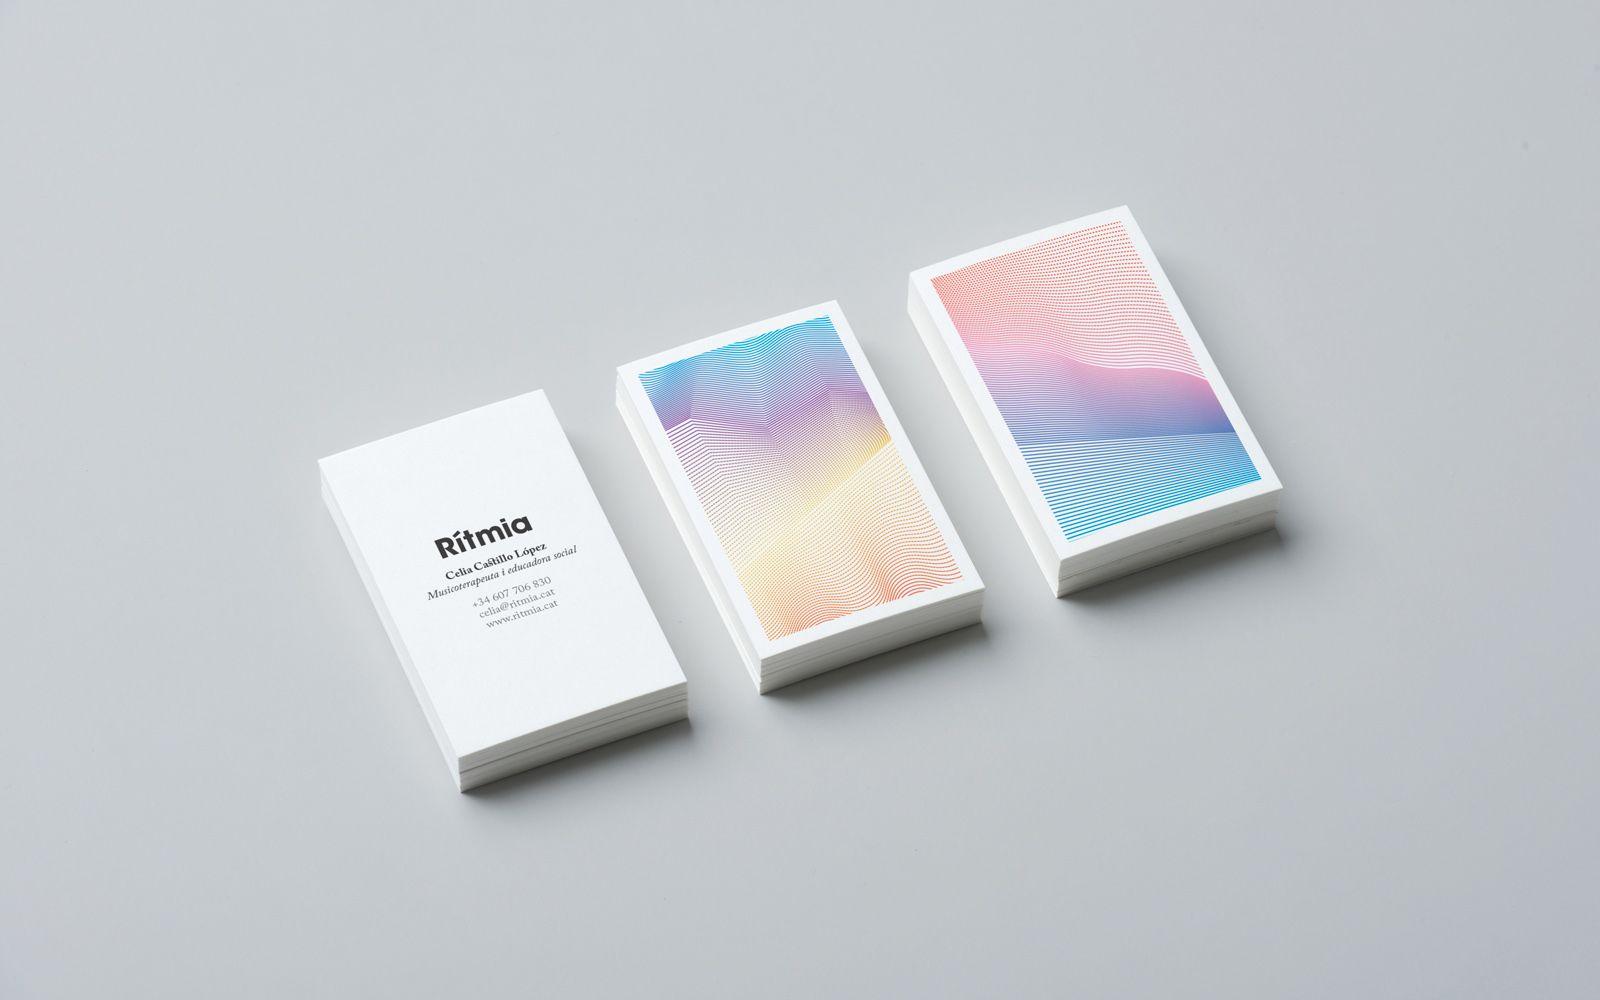 Ritmia atipus 05 moja firma pinterest corporate branding ritmia atipus 05 business card magicingreecefo Images